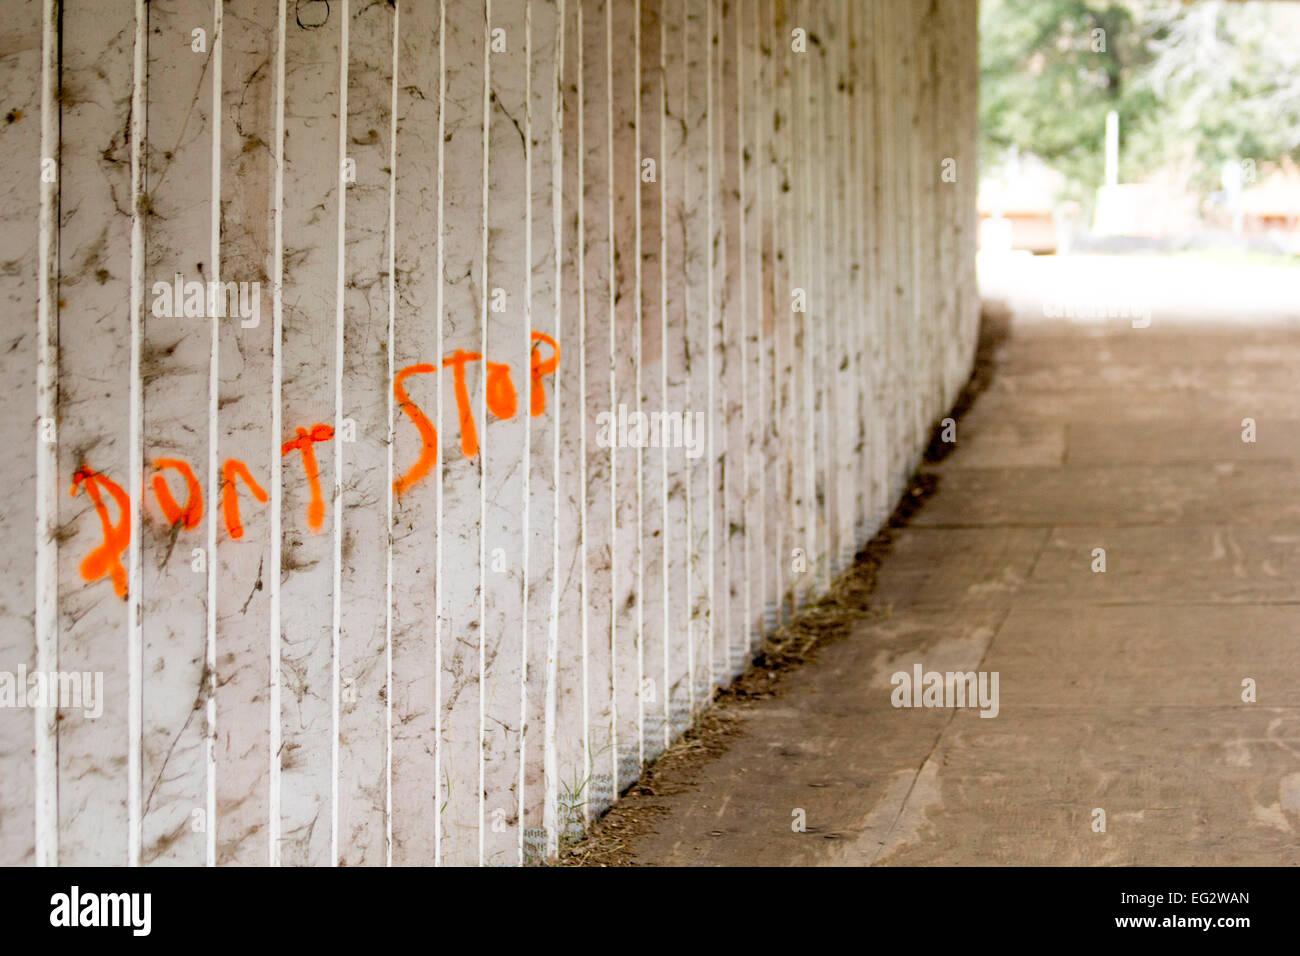 A bit of encouraging vandalism. - Stock Image